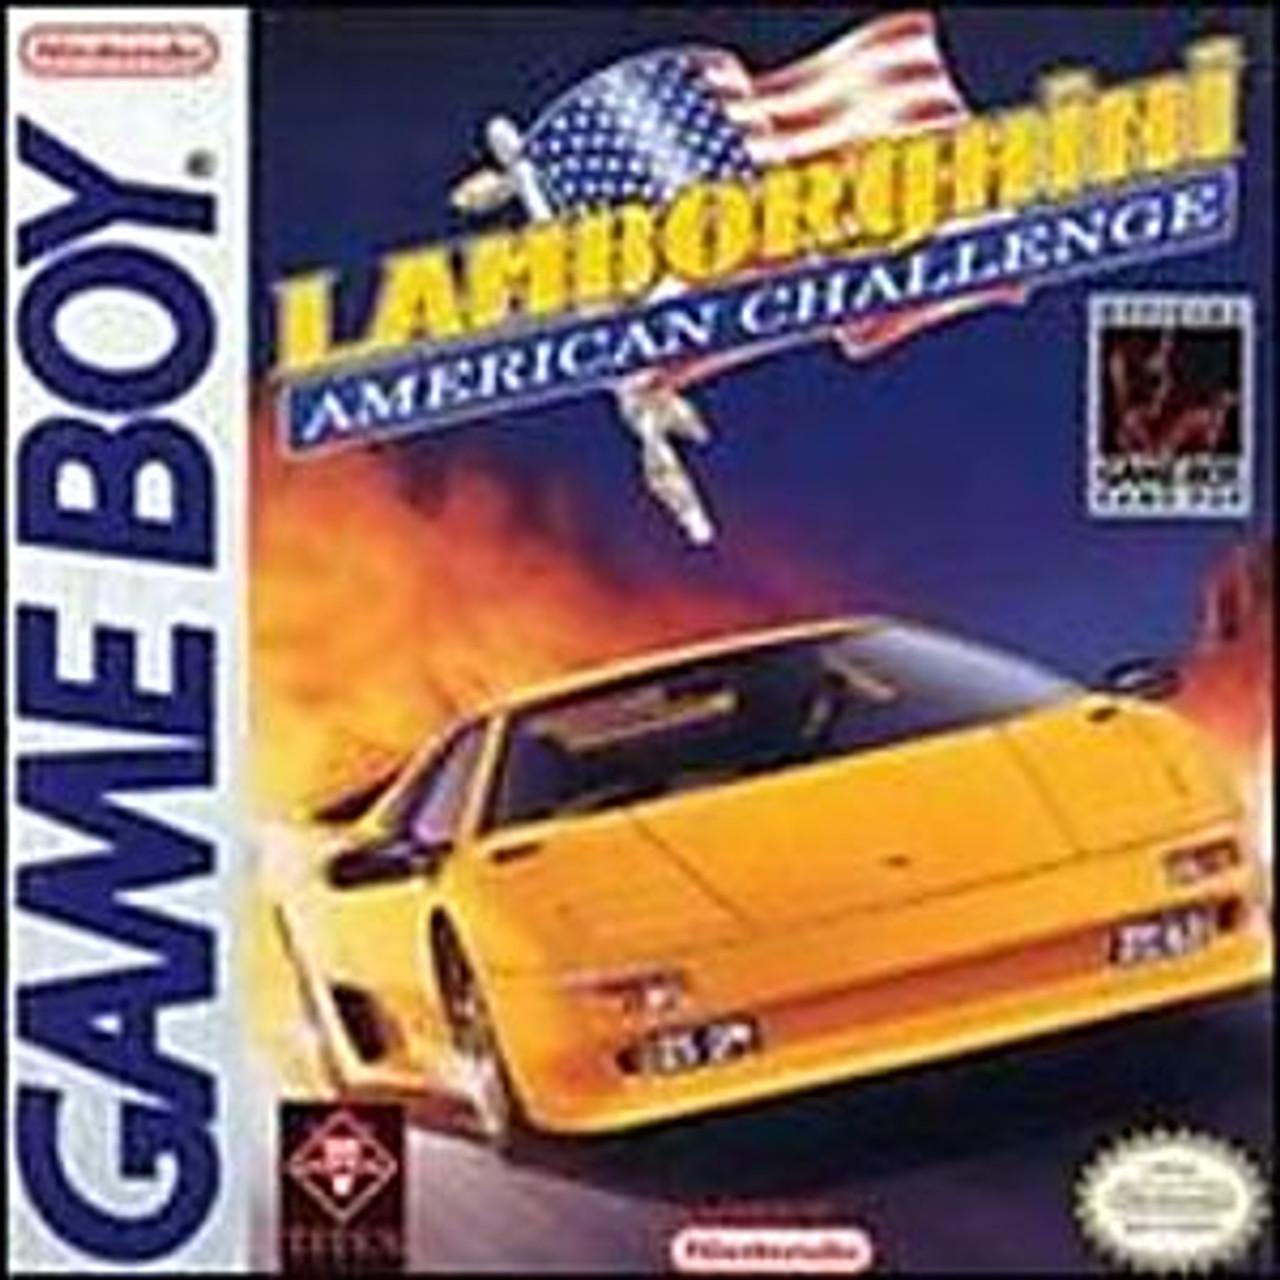 LAMBORGHINI AMERICAN CHALLENGE - GB